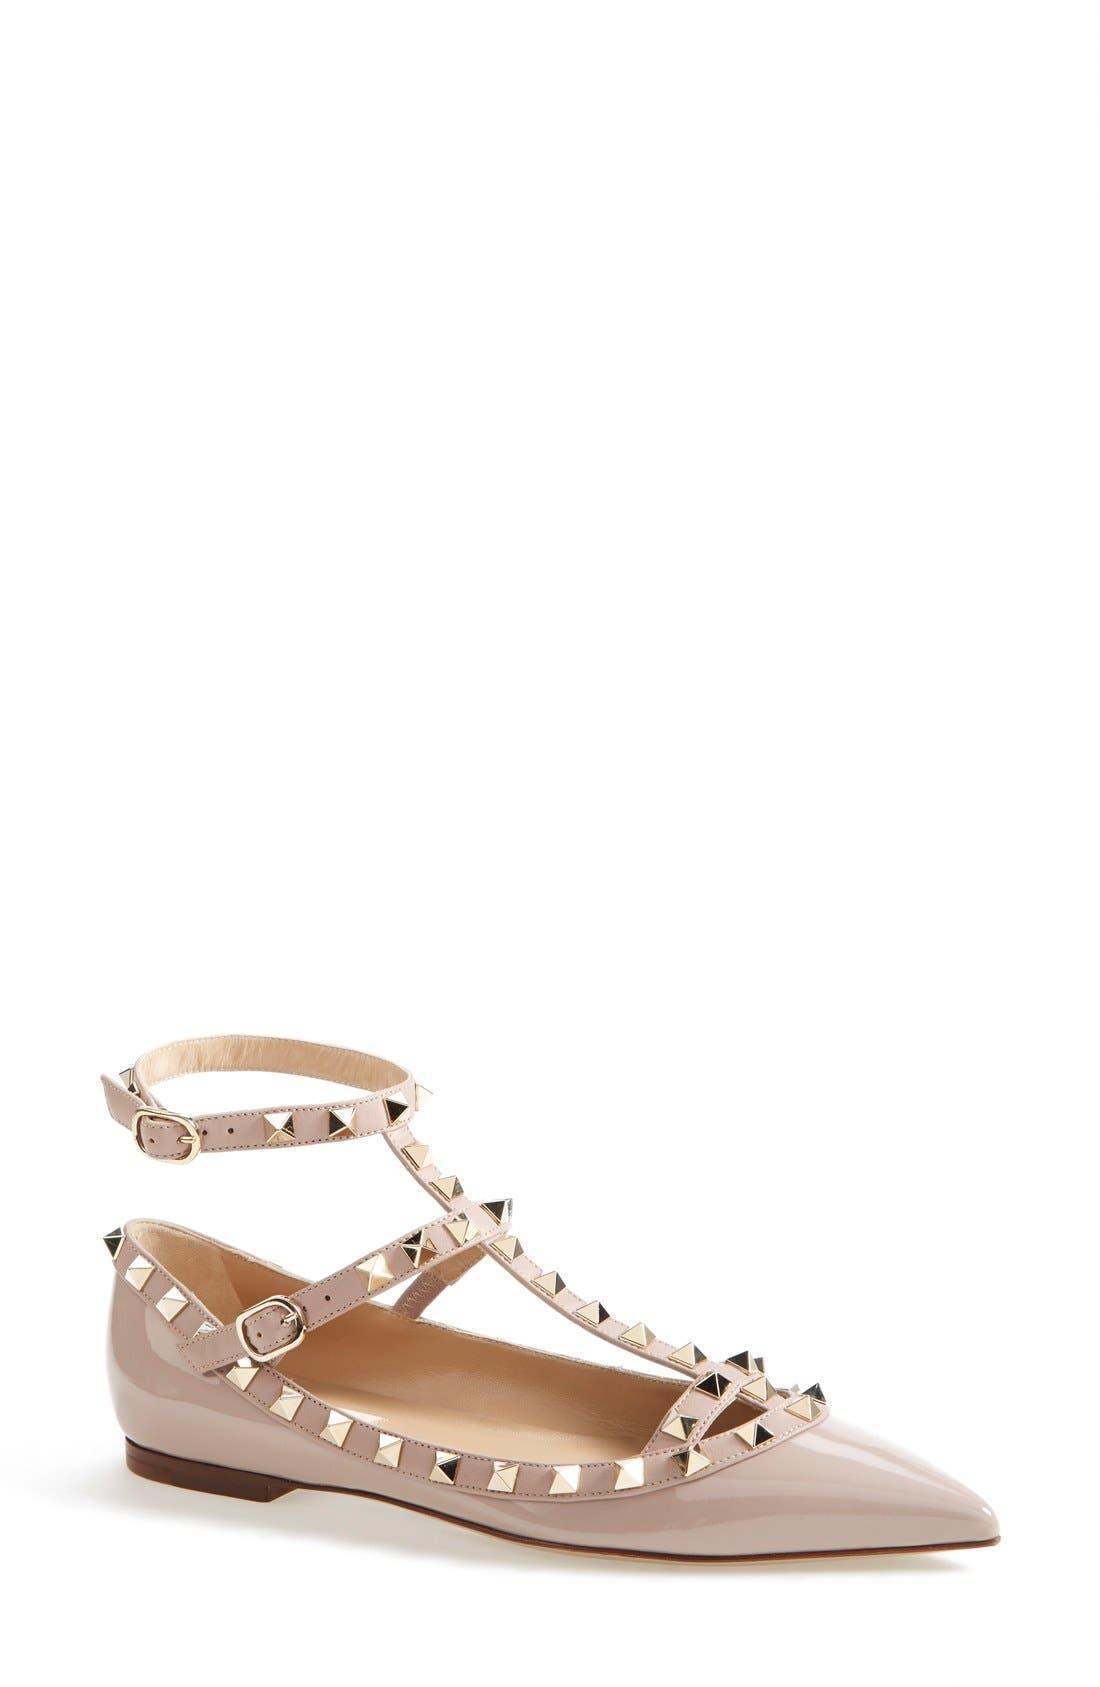 Alternate Image 1 Selected - Valentino 'Rockstud' Patent Leather T-Strap Ballerina Flat (Women)